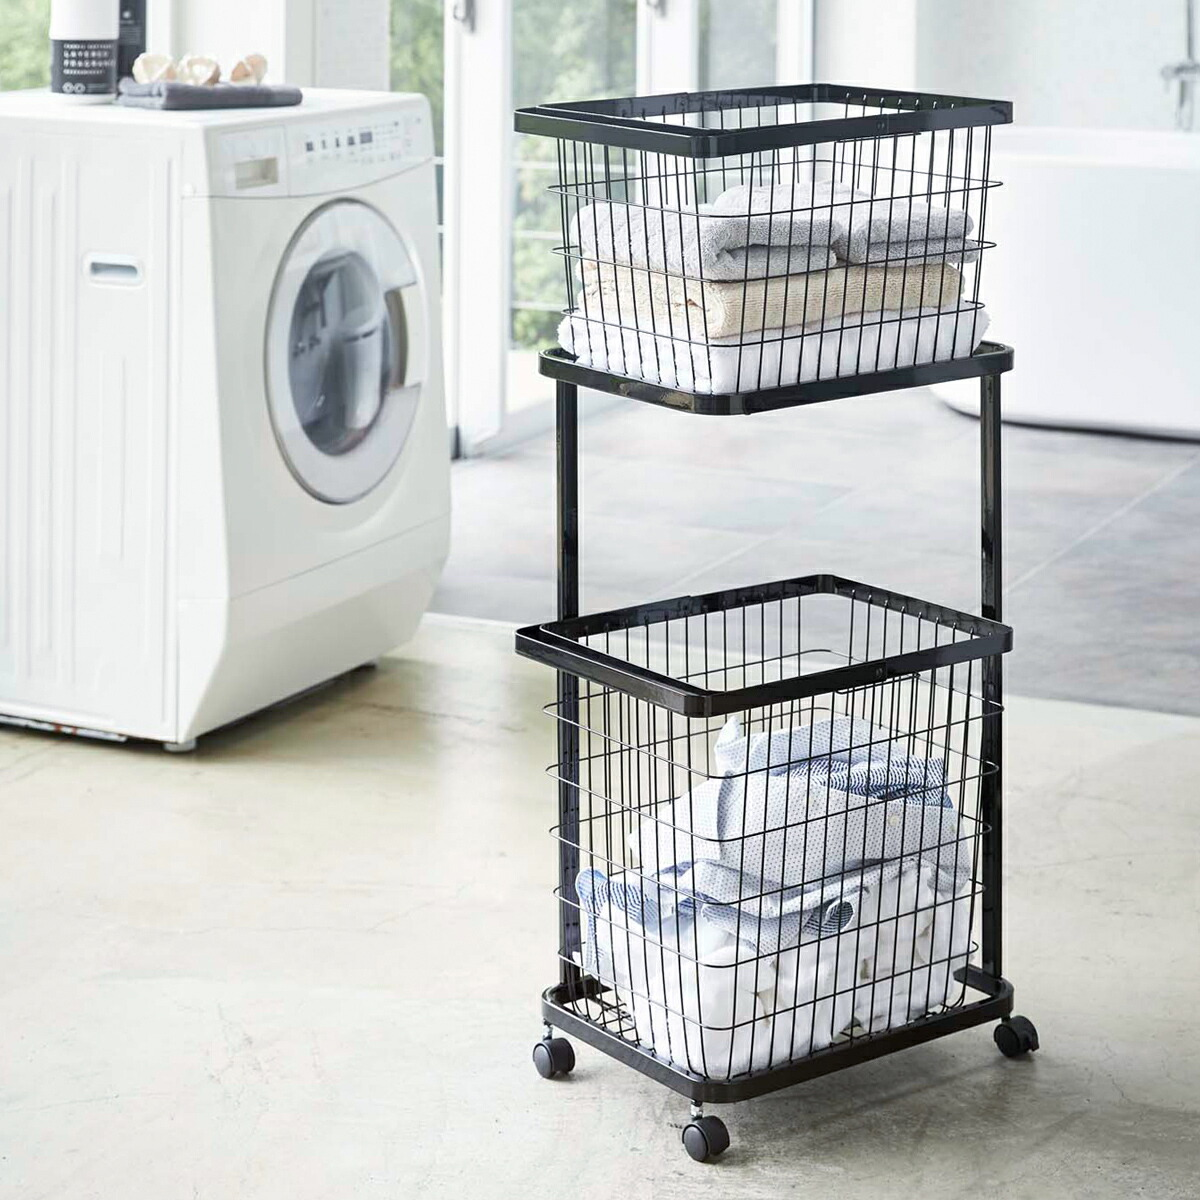 tower / タワー ランドリーワゴン+バスケットセット ランドリー 洗濯かご 収納